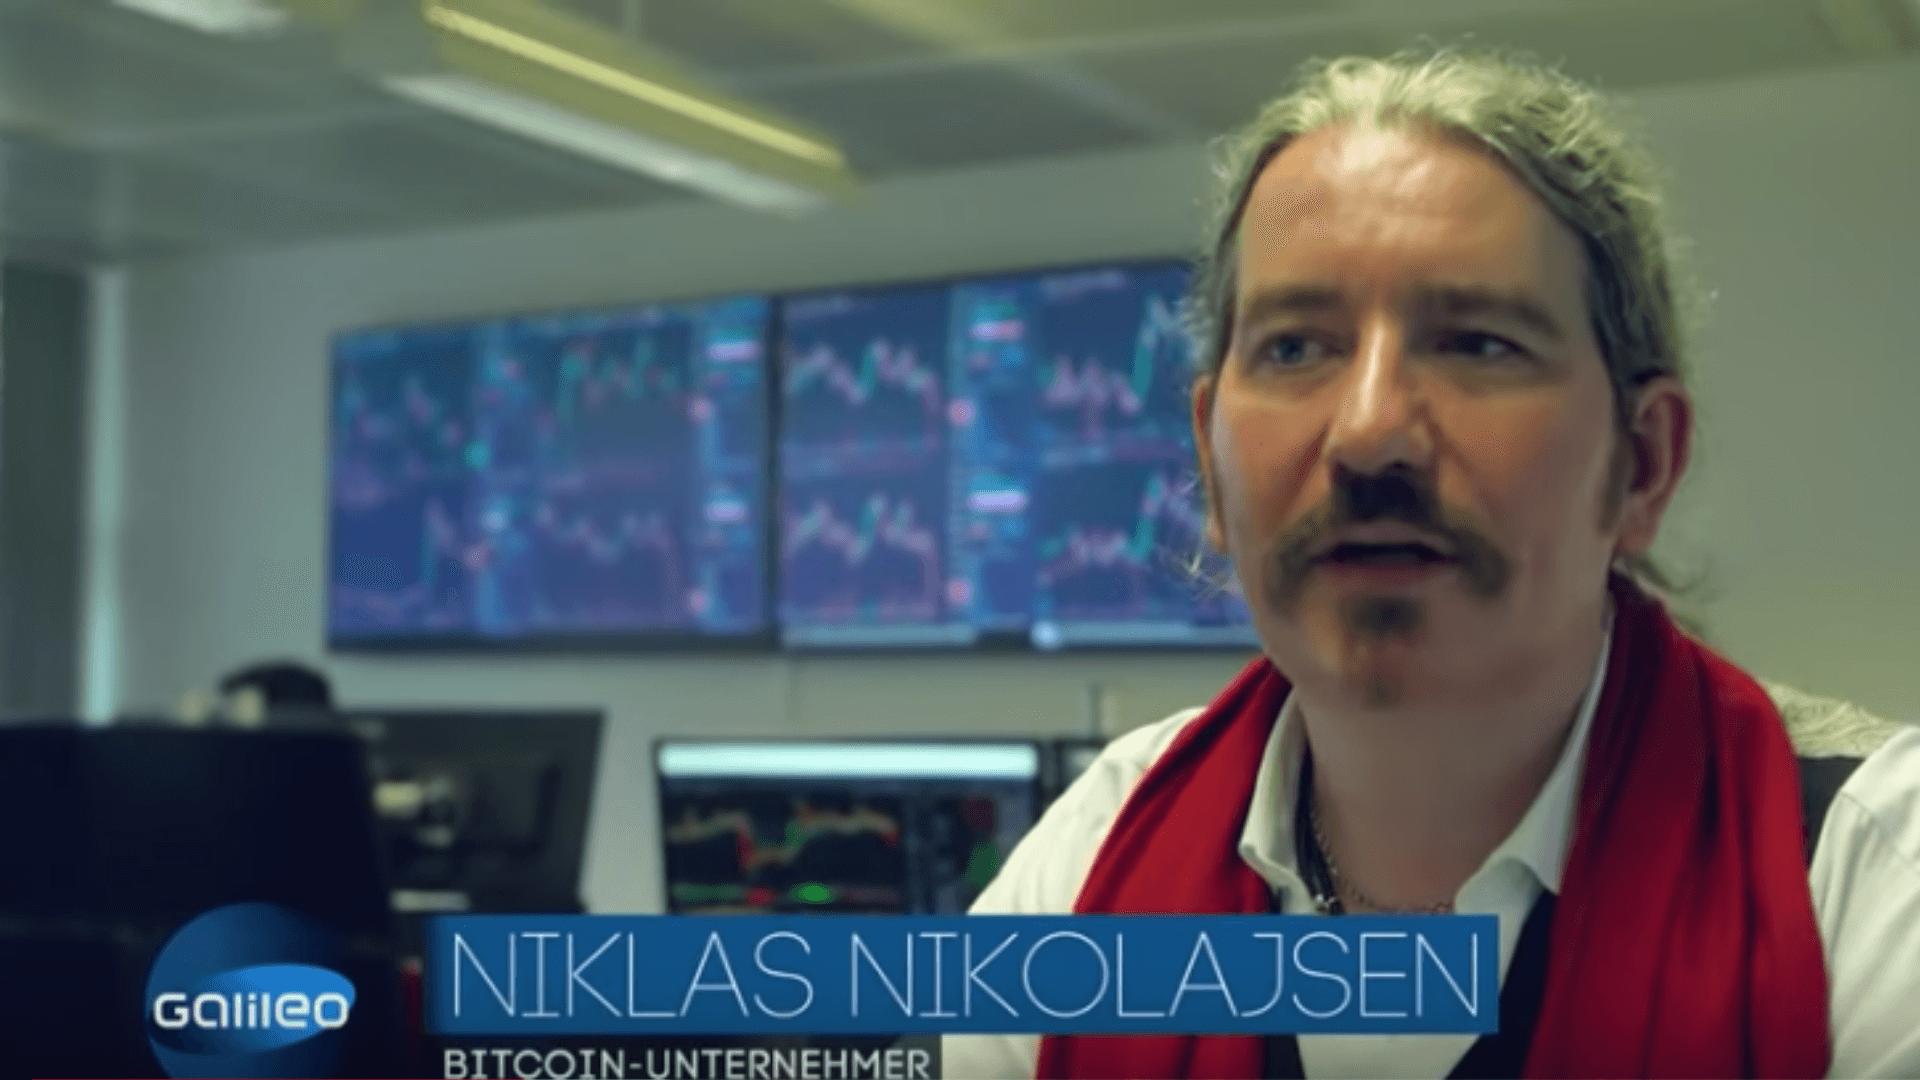 Niklas Nikolajsen bei Galileo